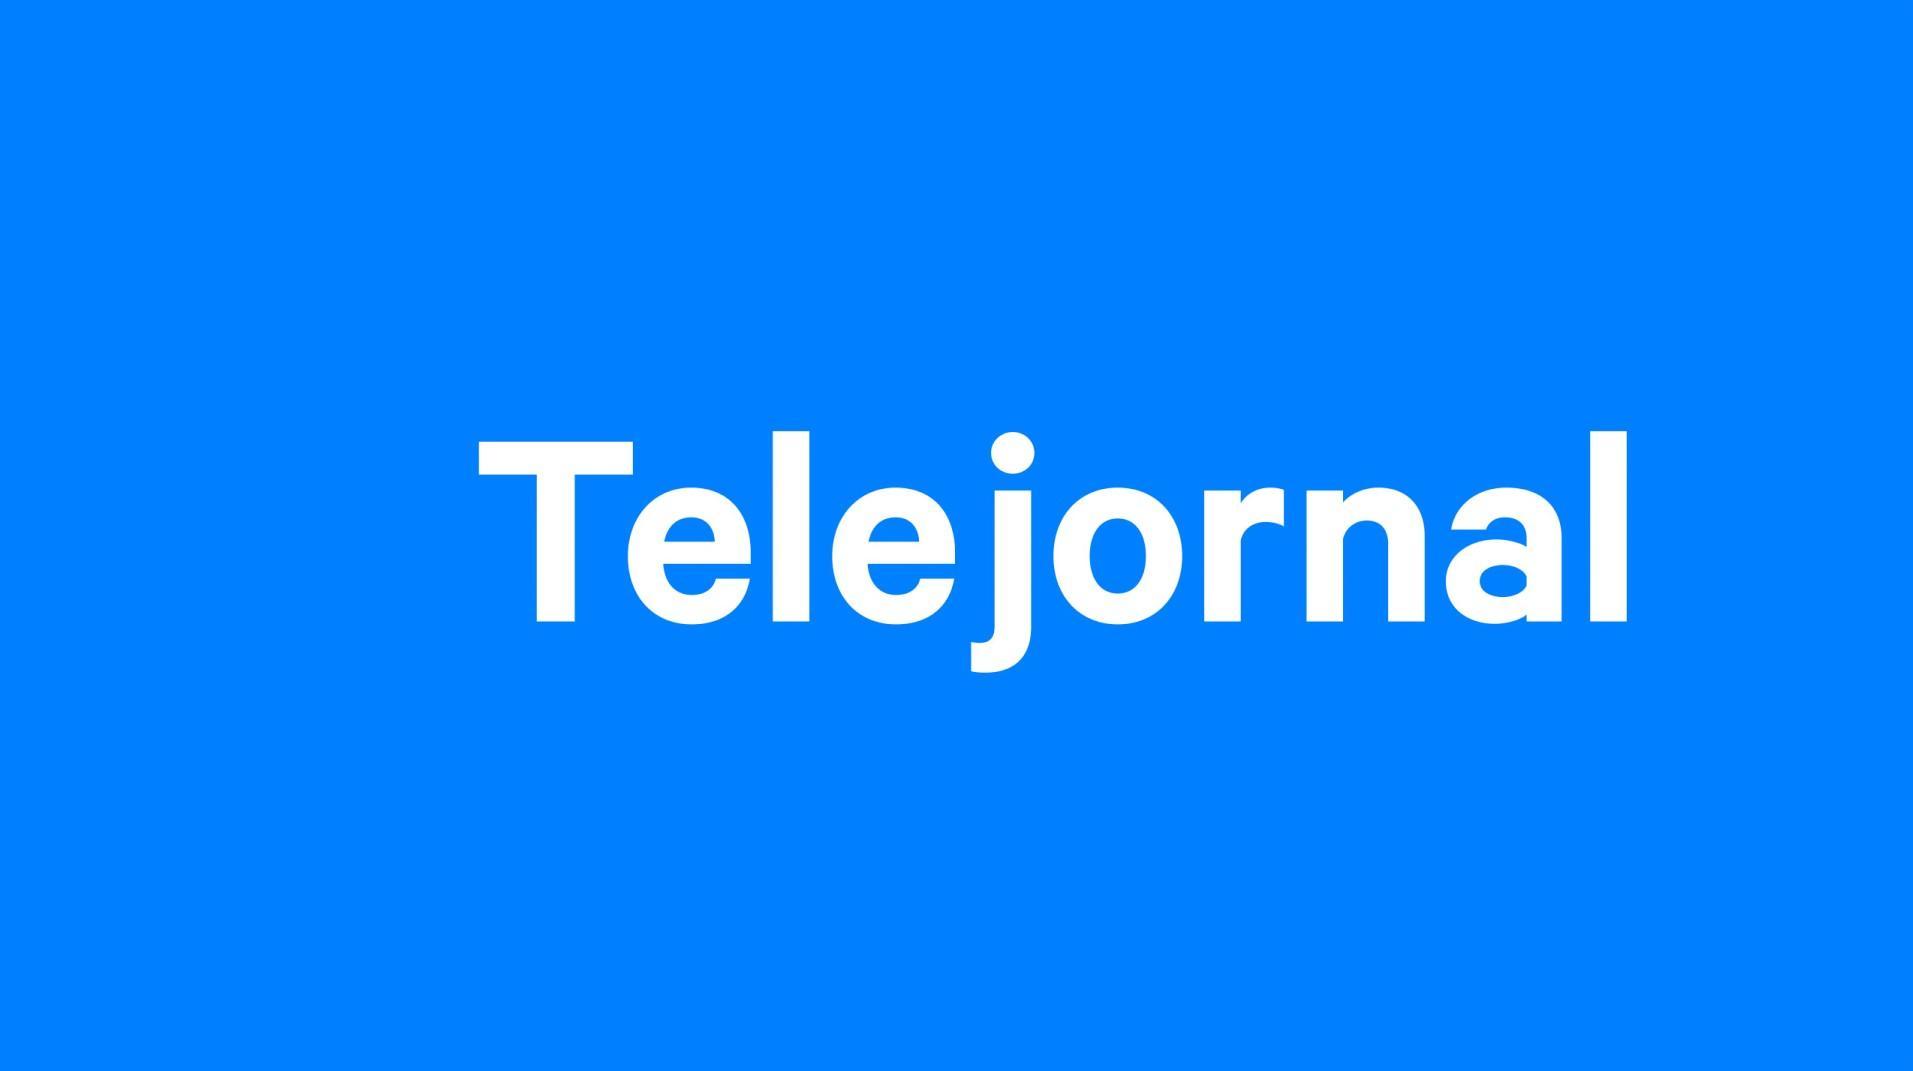 Telejornal - Temporada